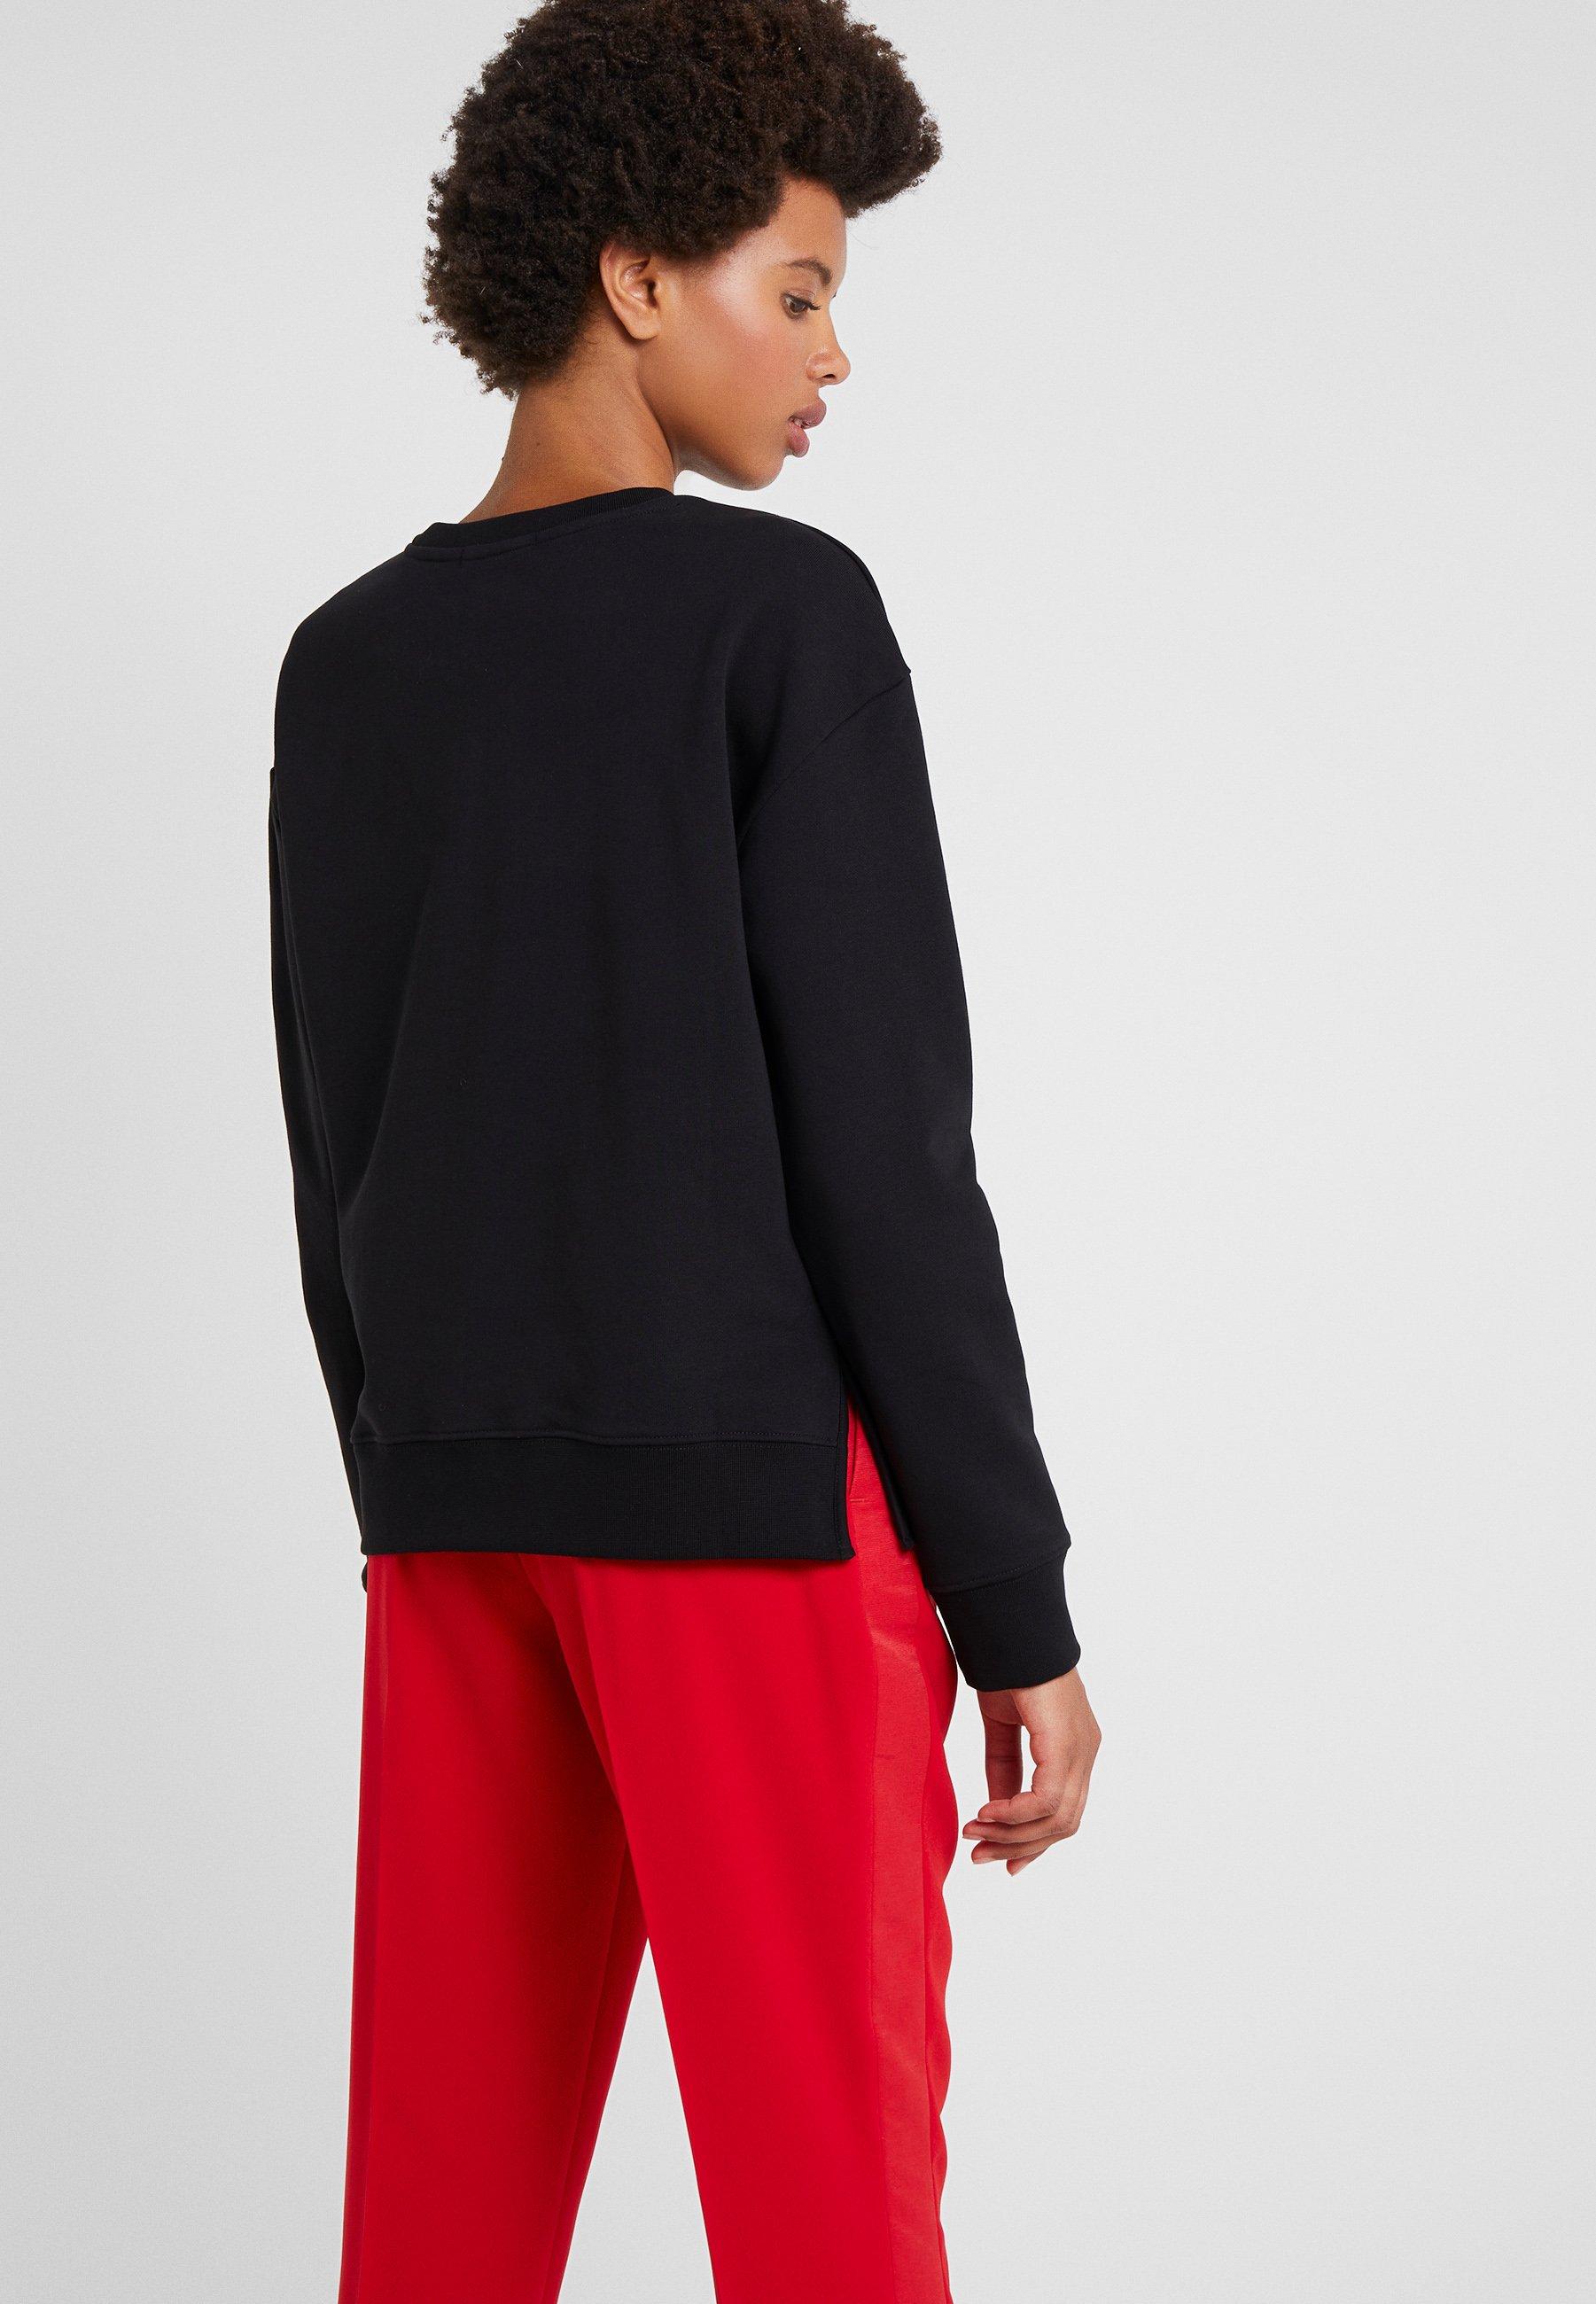 Vivetta Black Vivetta Black FelpaSweatshirt FelpaSweatshirt FelpaSweatshirt Vivetta Vivetta Black SpzMVqUG